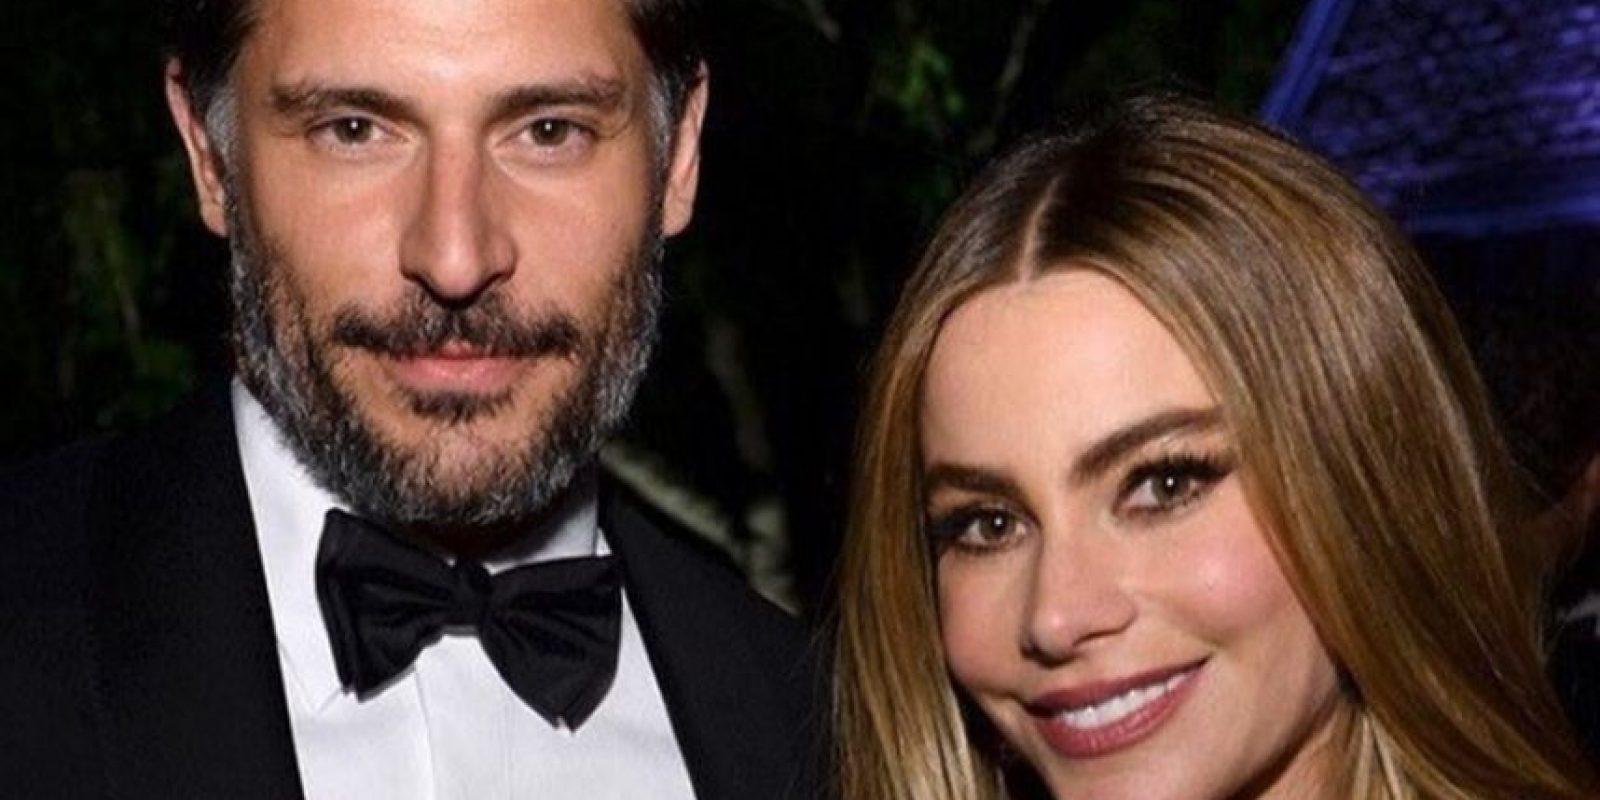 Foto:Vía instagram.com/joemanganiello